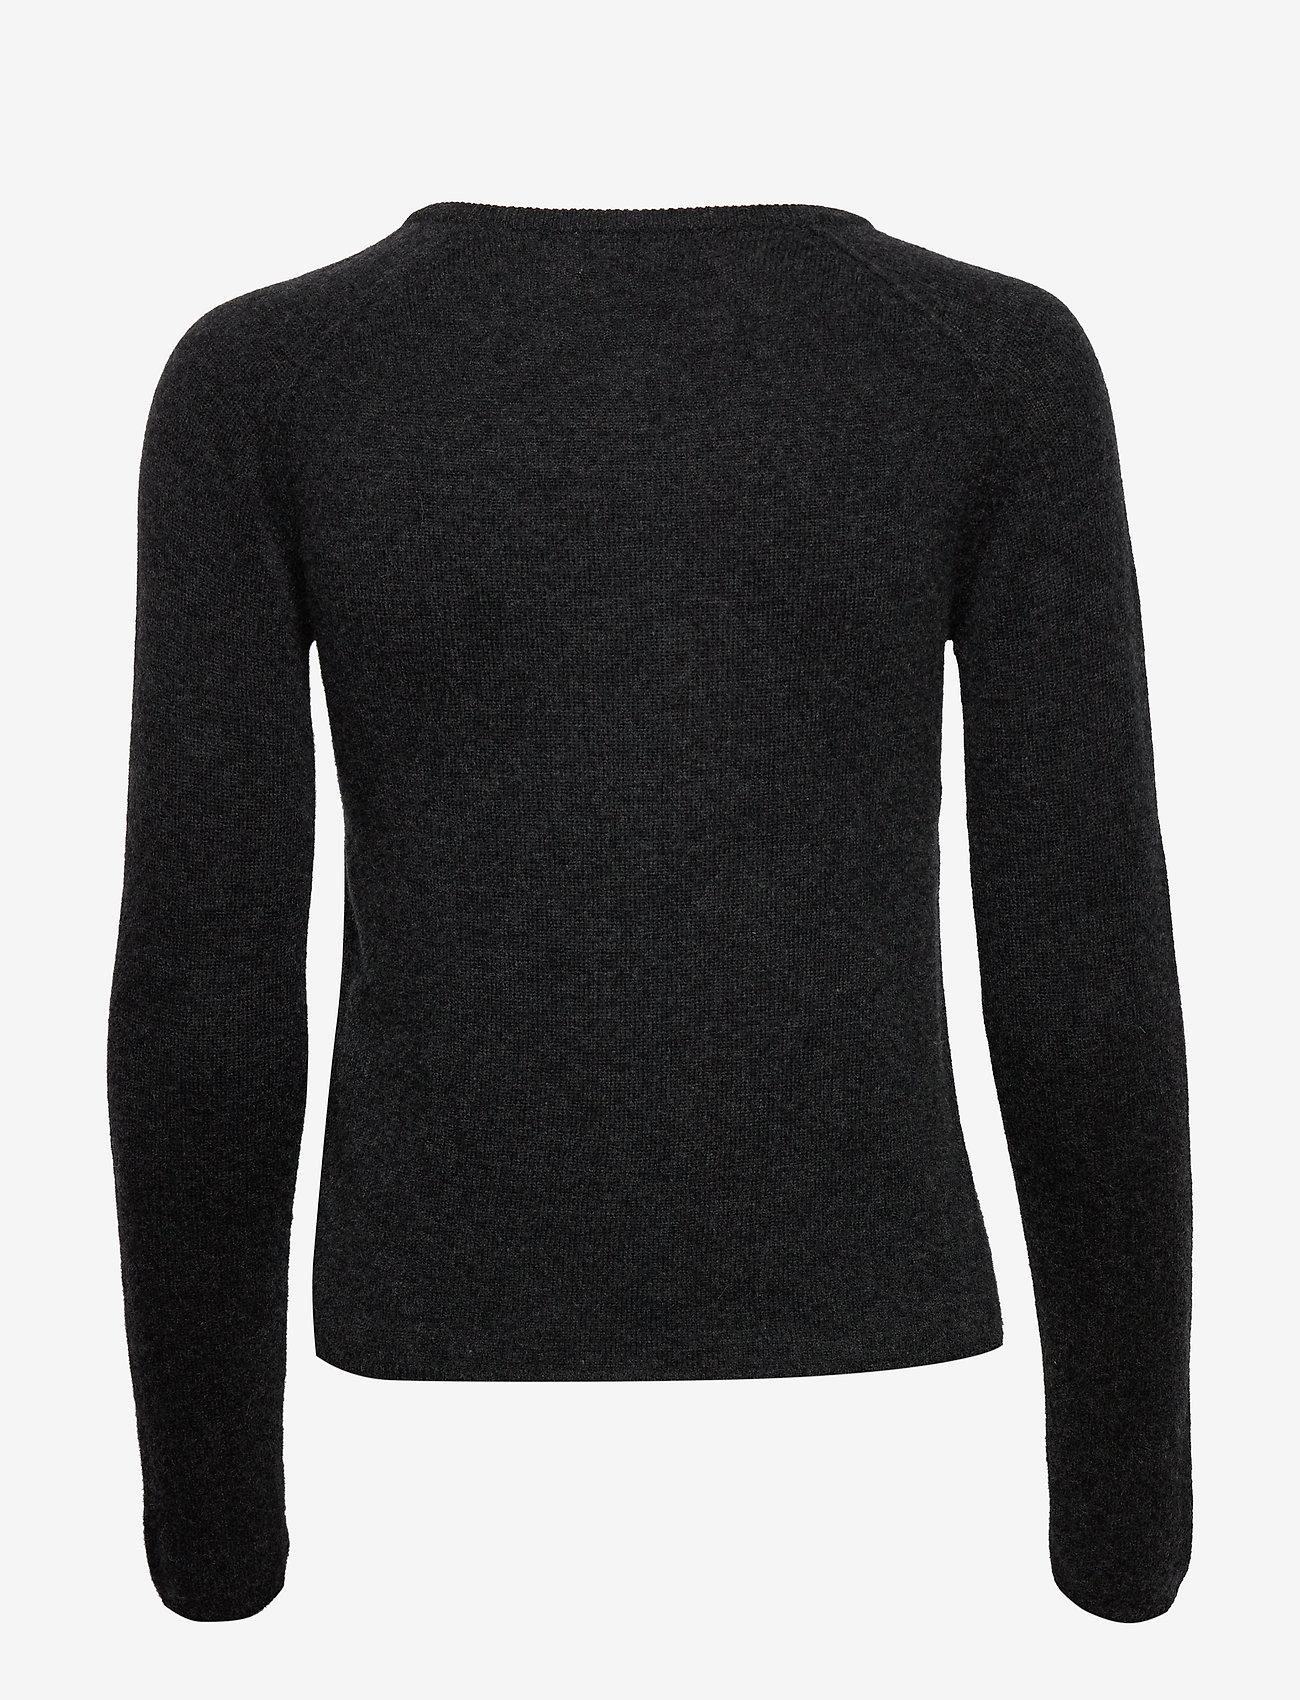 Rosemunde - Wool & cashmere cardigan ls - koftor - dark grey melange - 1